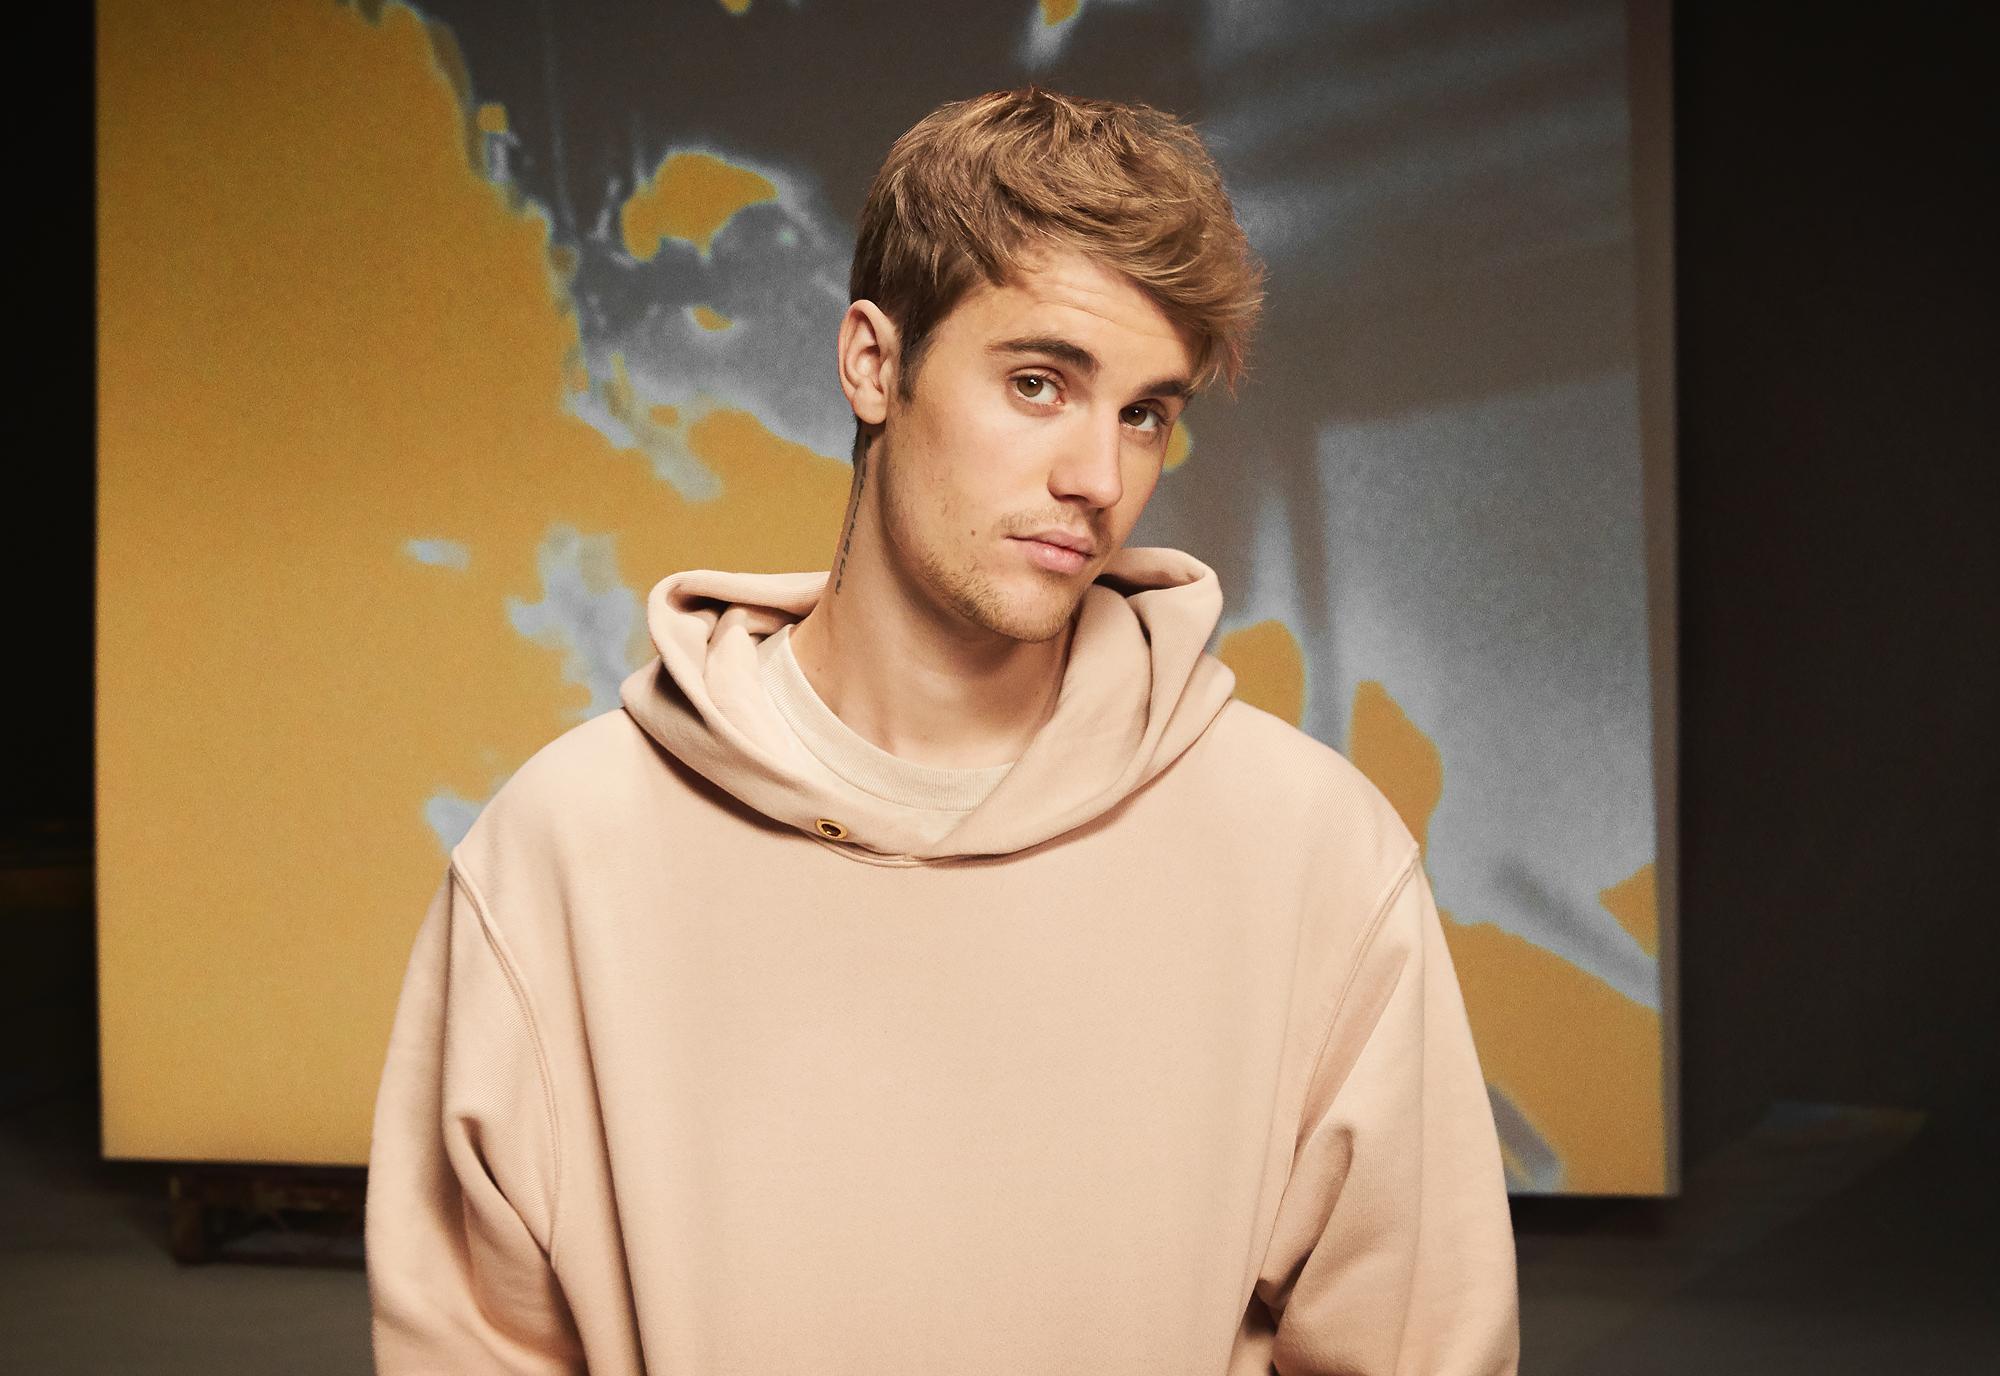 Justin Bieber x Schmidt's Here + Now Deodorant 48-Hour Preview